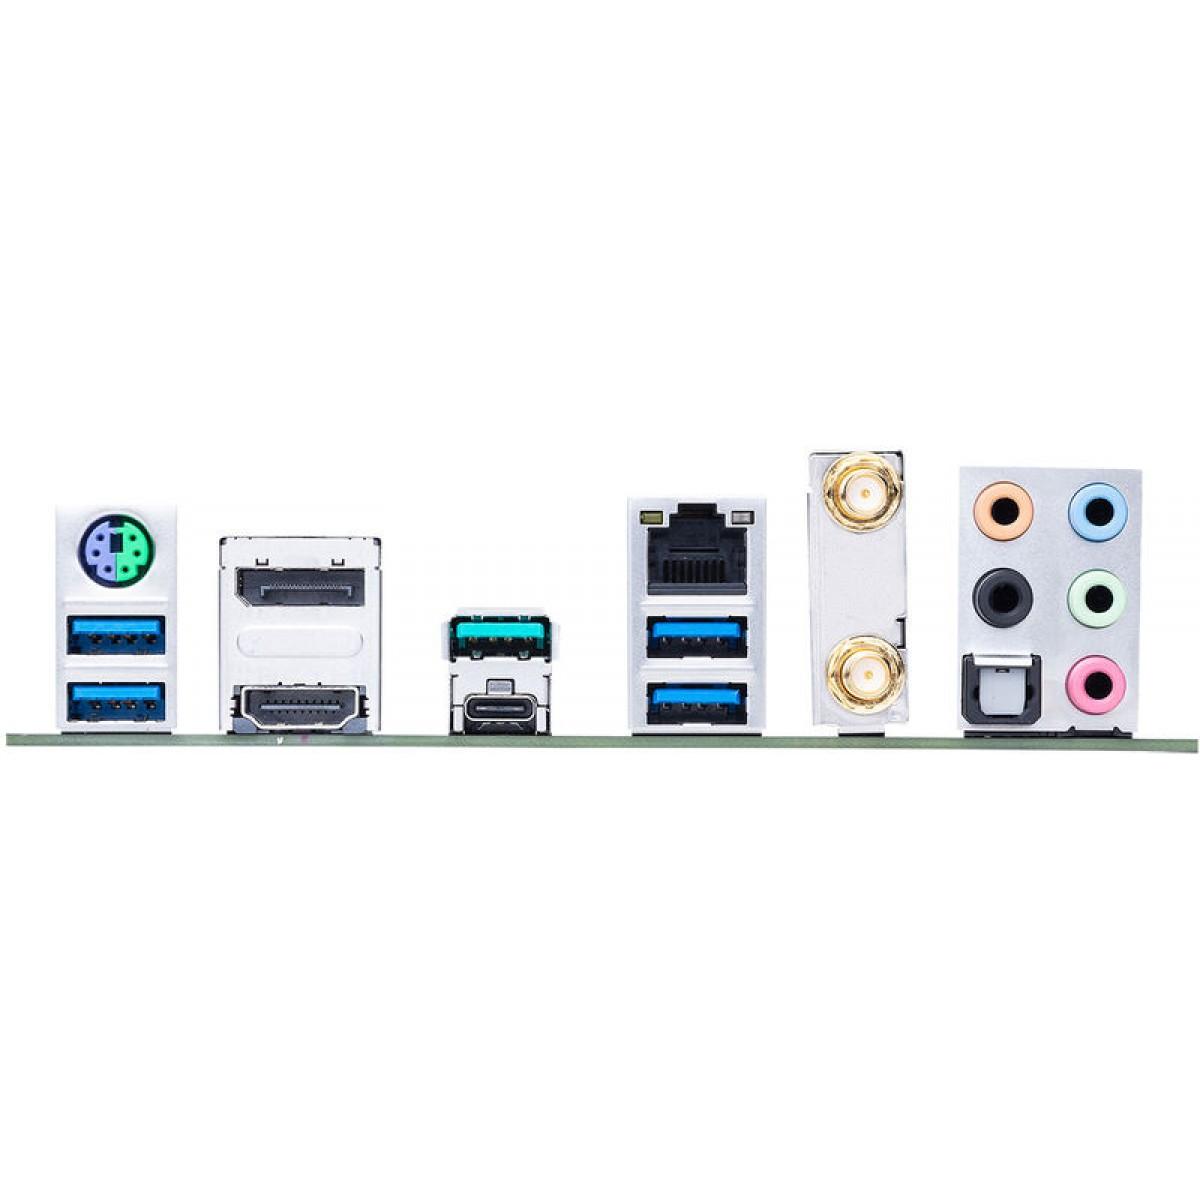 Placa Mãe Asus Tuf Gaming Z490-Plus Wi-Fi, Chipset Z490, Intel LGA 1200, ATX, DDR4